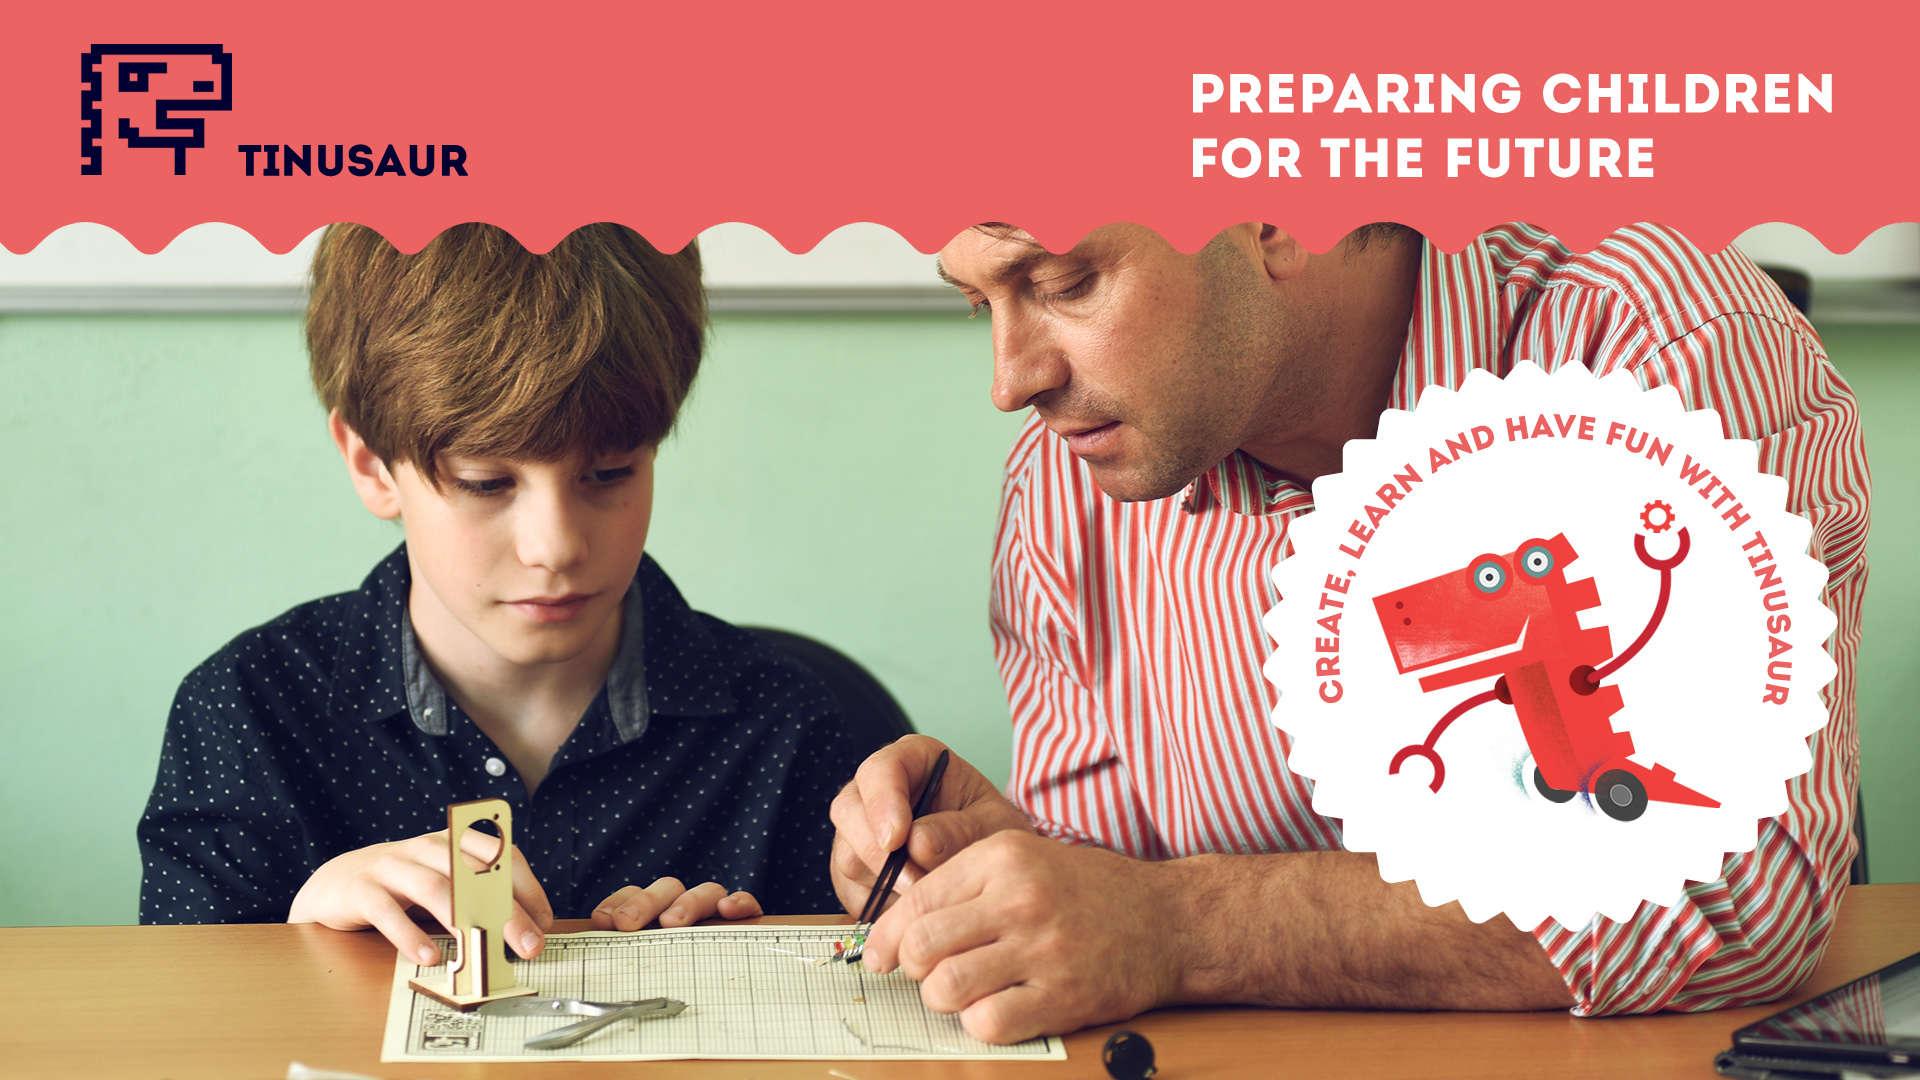 Tinusaur - Preparing children for the future